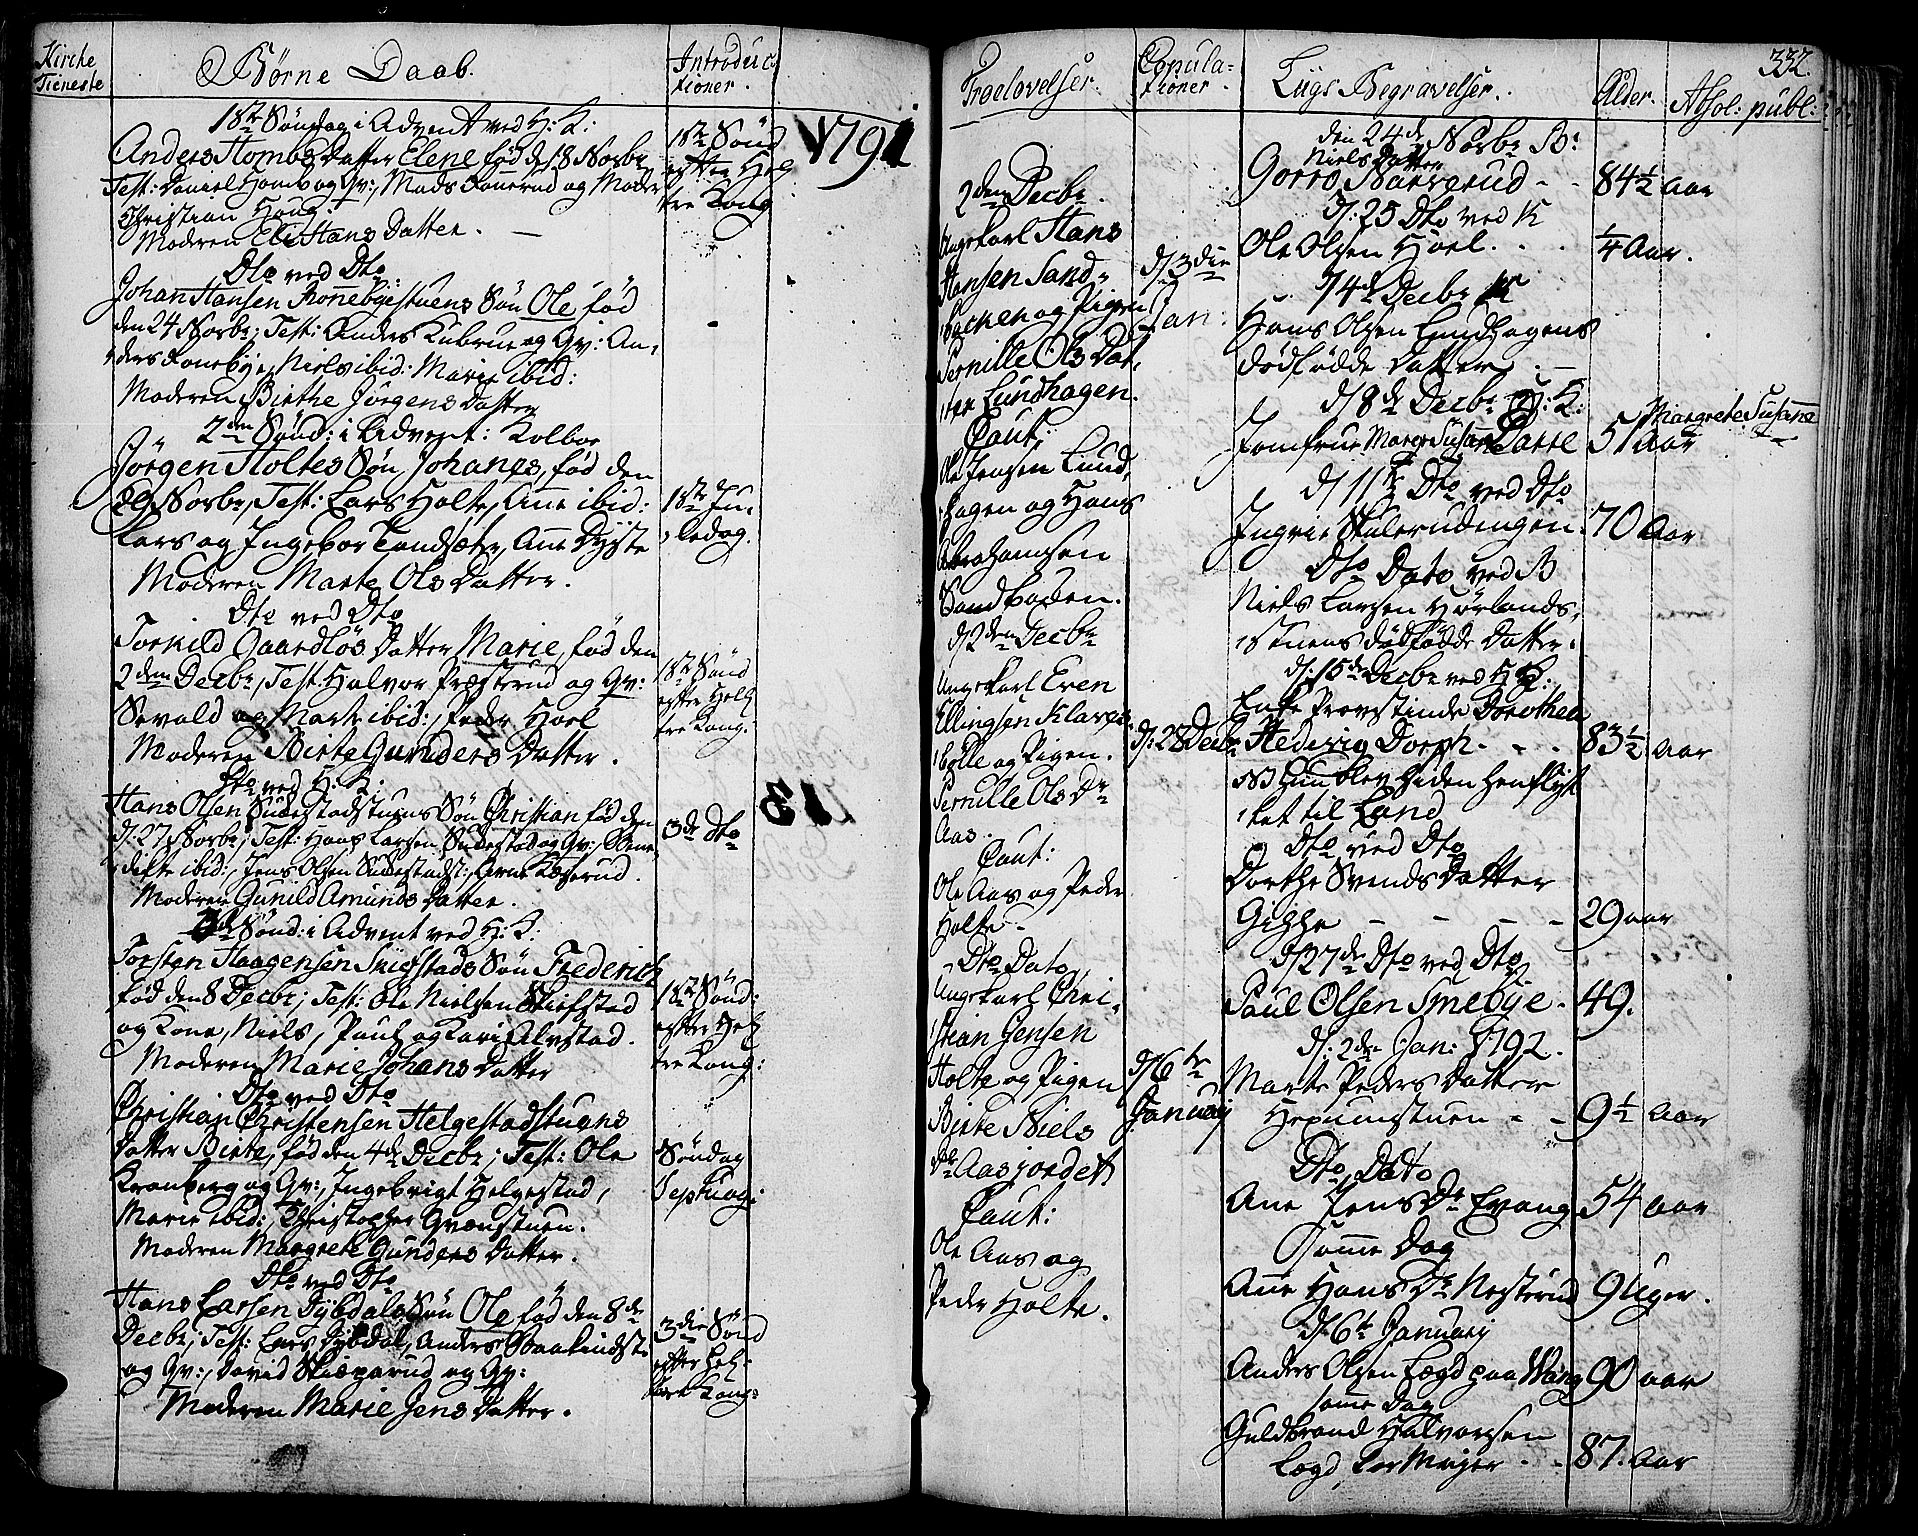 SAH, Toten prestekontor, Ministerialbok nr. 6, 1773-1793, s. 332